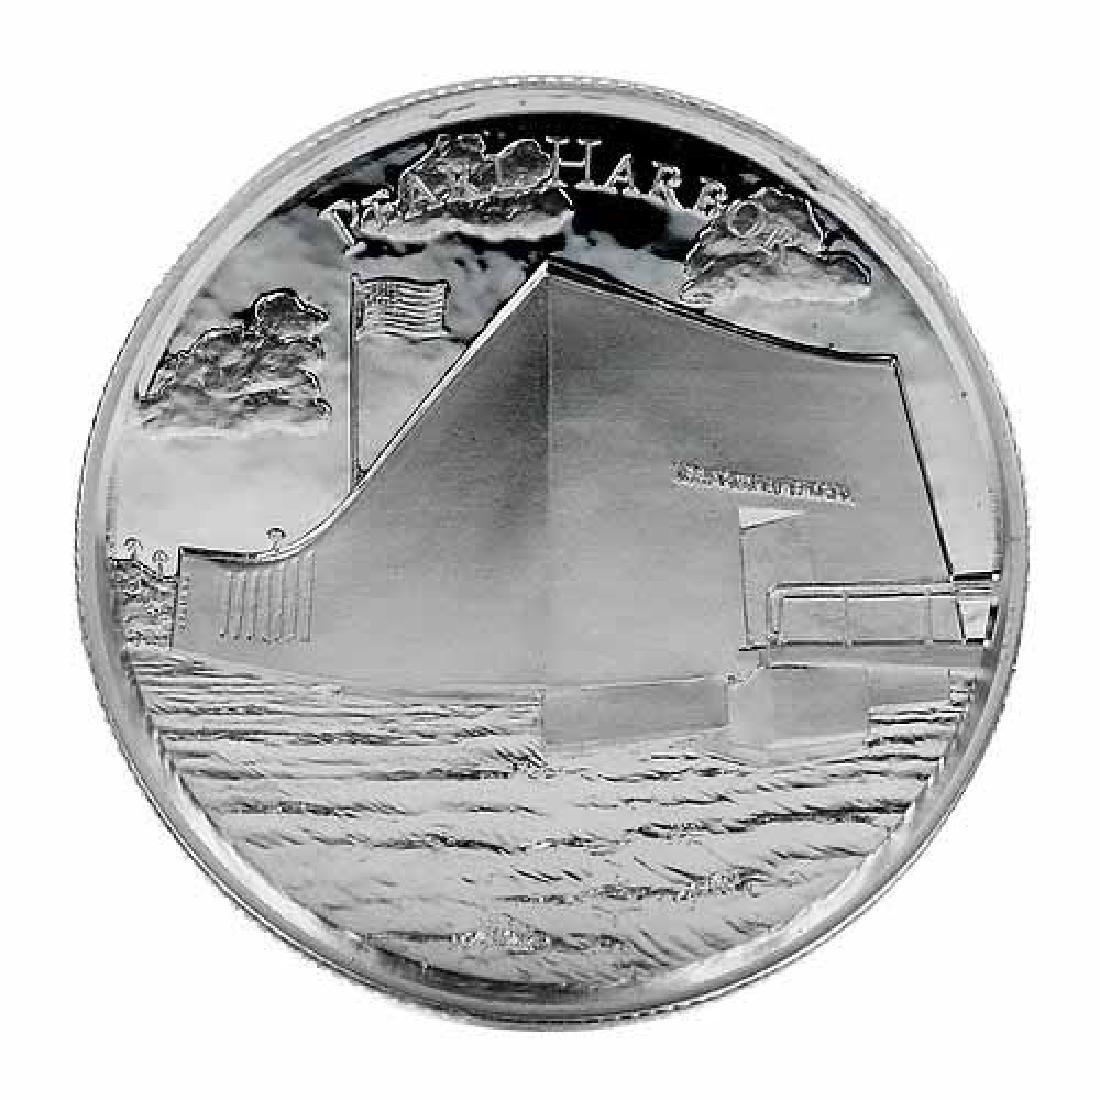 Elemetal Mint 2 oz High Relief Silver Round - Pearl Har